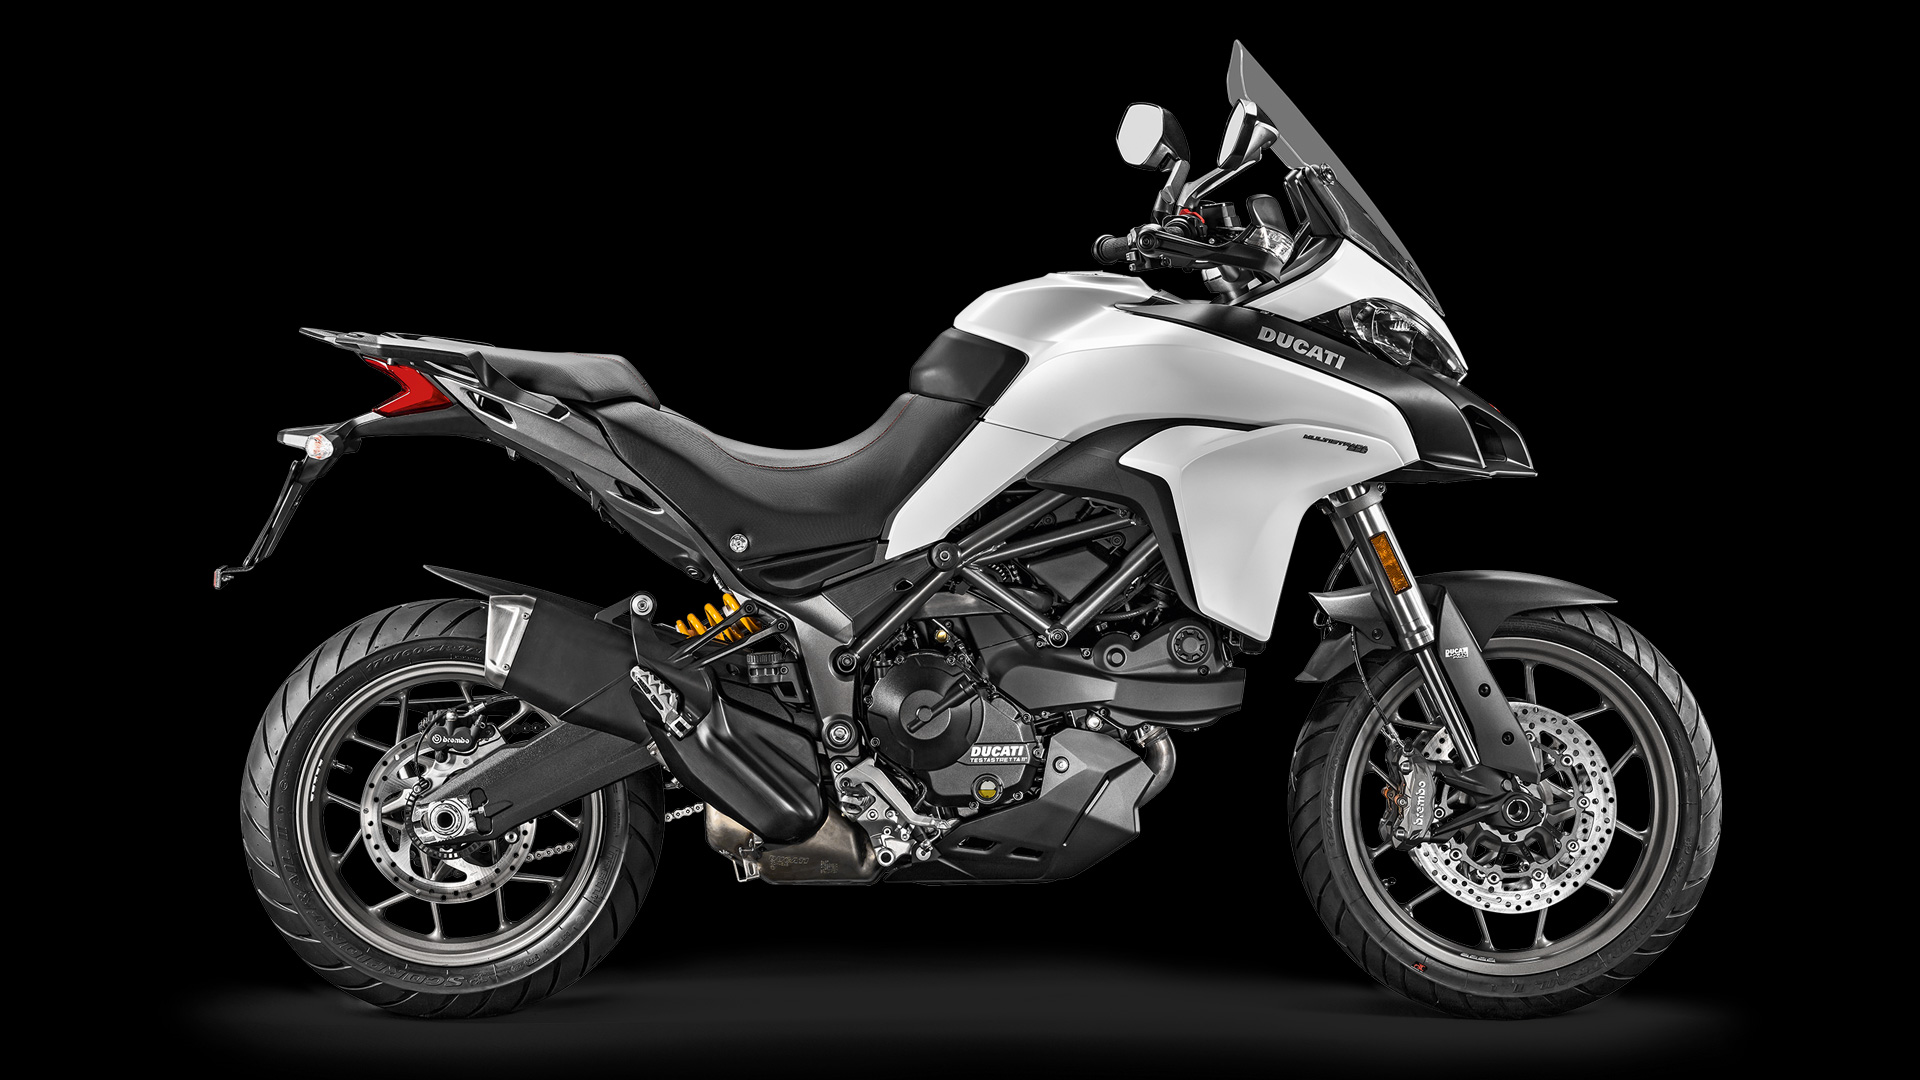 ducati multistrada 950 ultra versatile motorbike. Black Bedroom Furniture Sets. Home Design Ideas